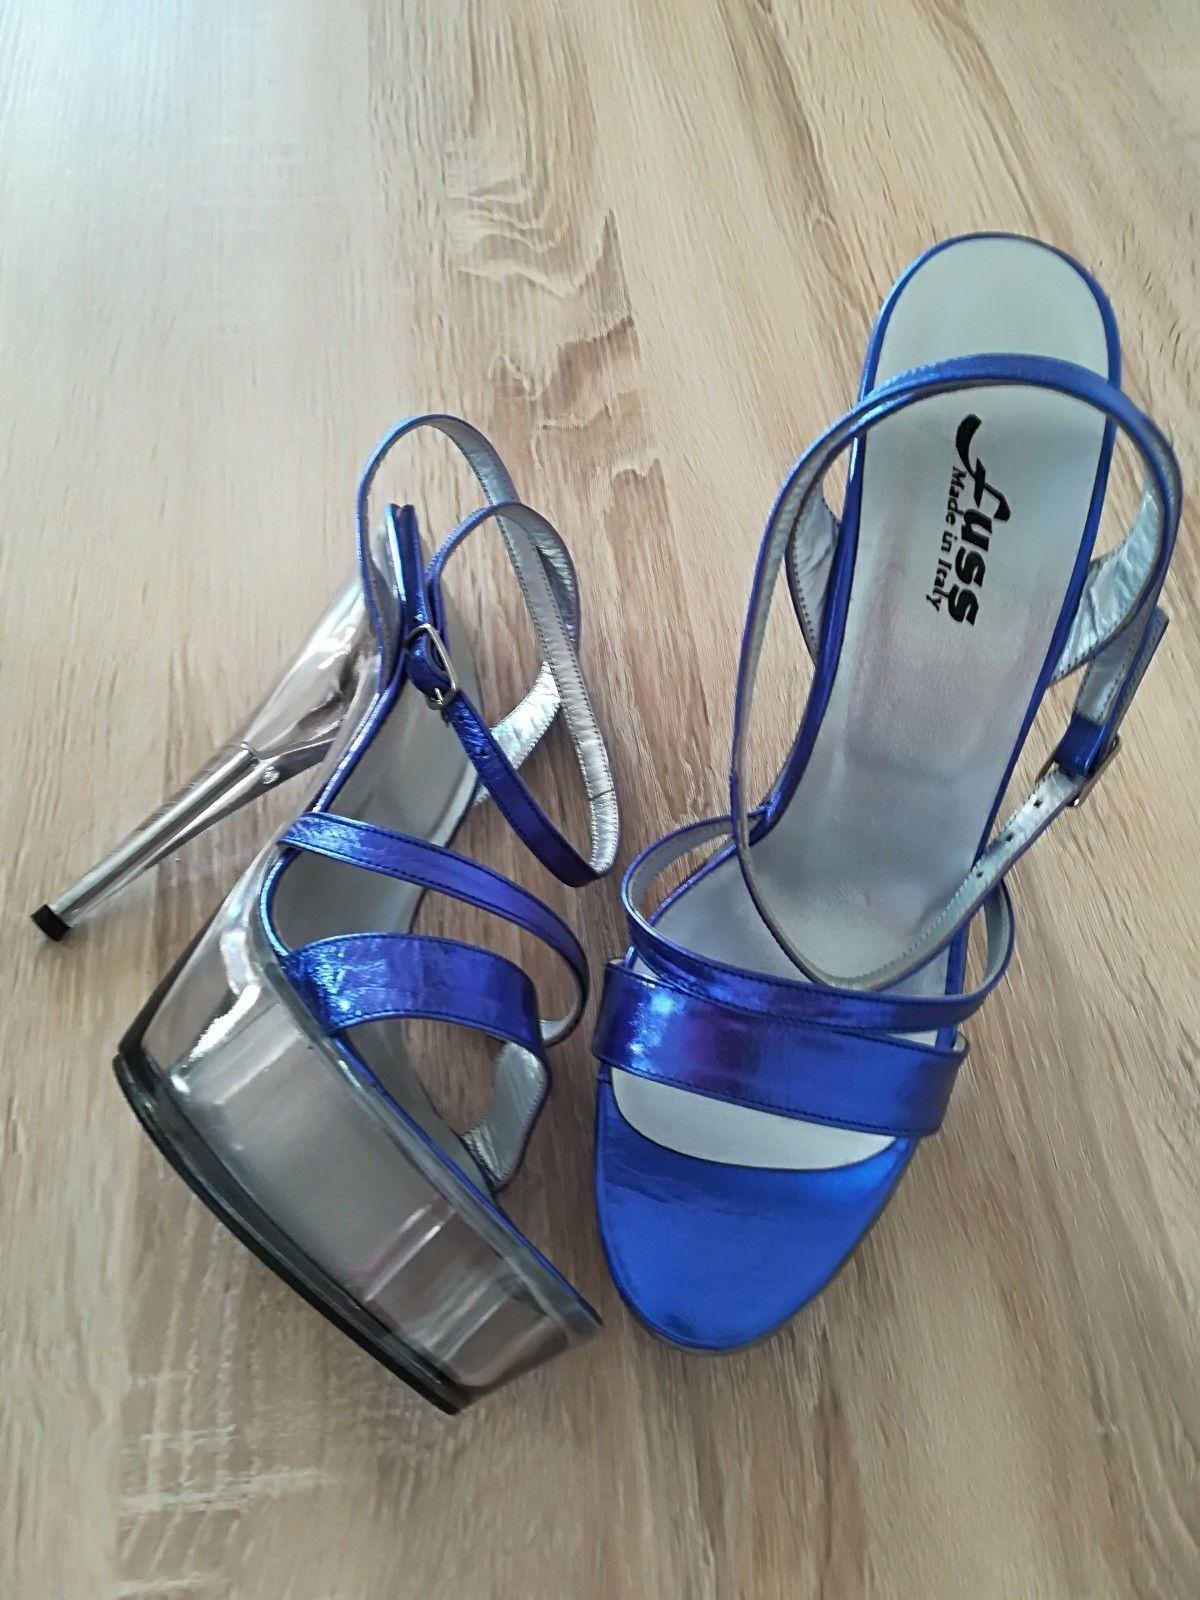 FUSS 16cm Sexy metallic bluee platform platform platform 4cm sandals crystal high heels 40 6cfcb2